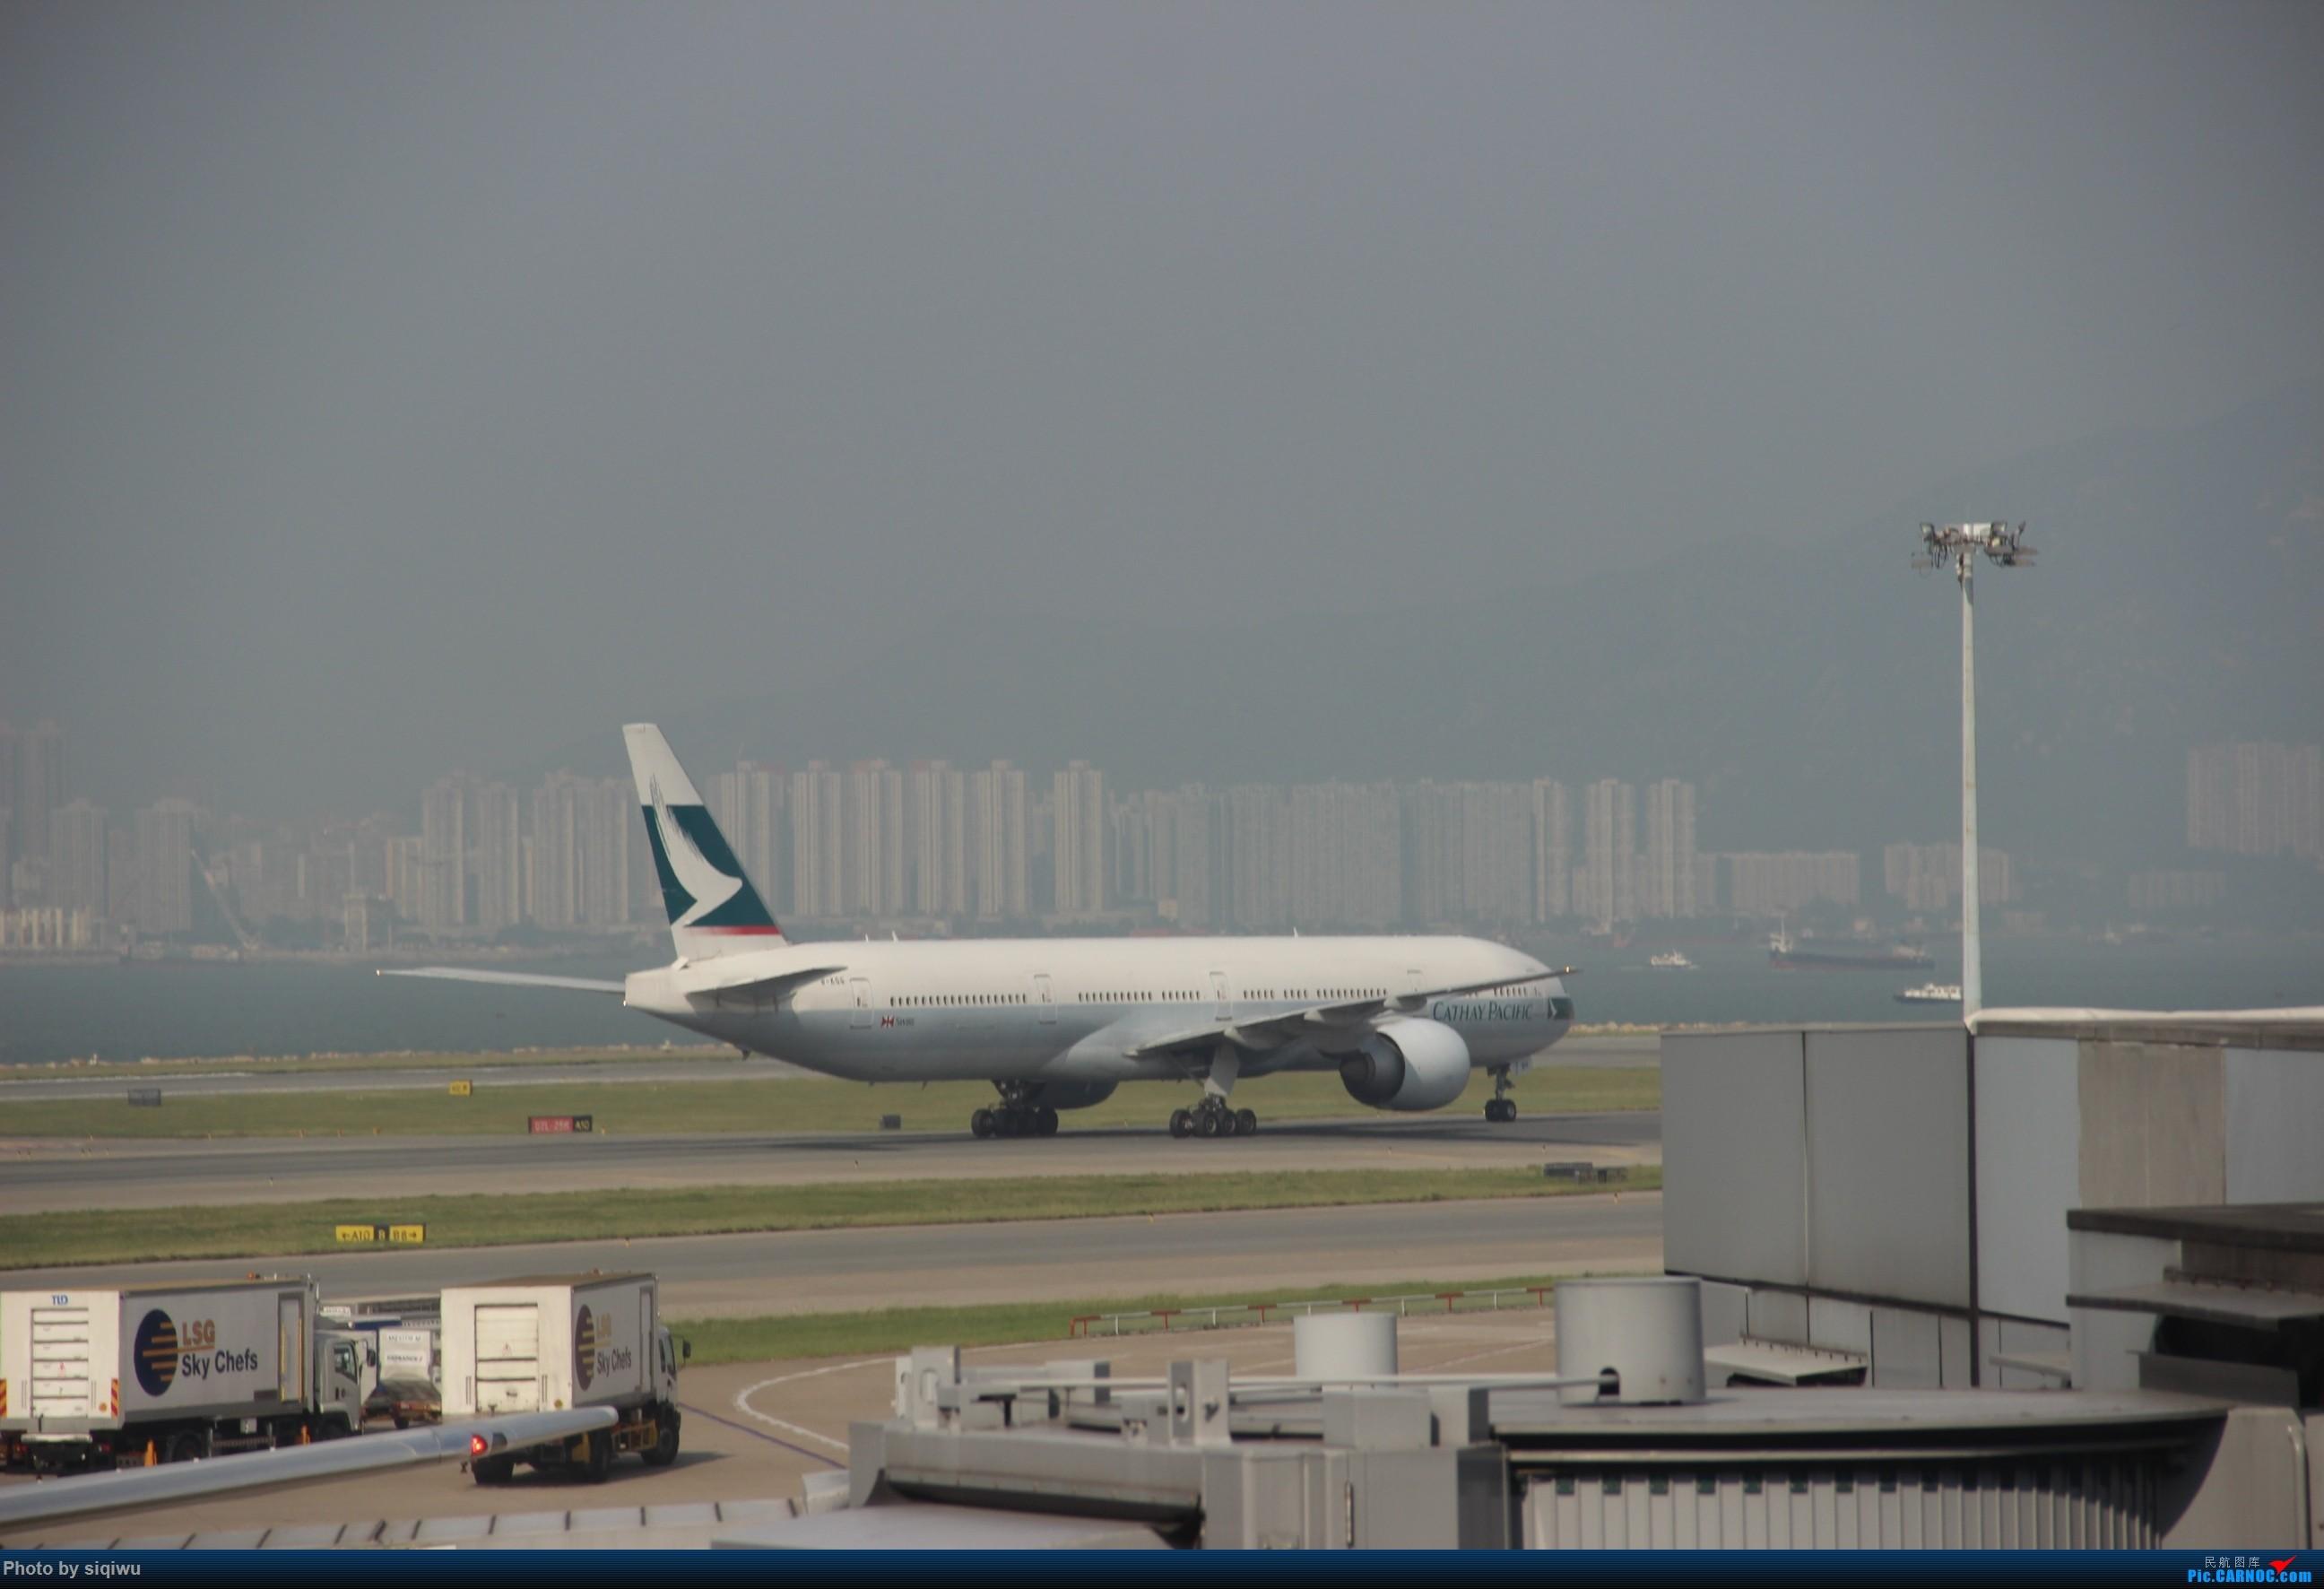 Re:[原创]PVG-HKG-KUL-HKG-PVG 四天往返,CX/KA BOEING 777-300  中国香港国际机场